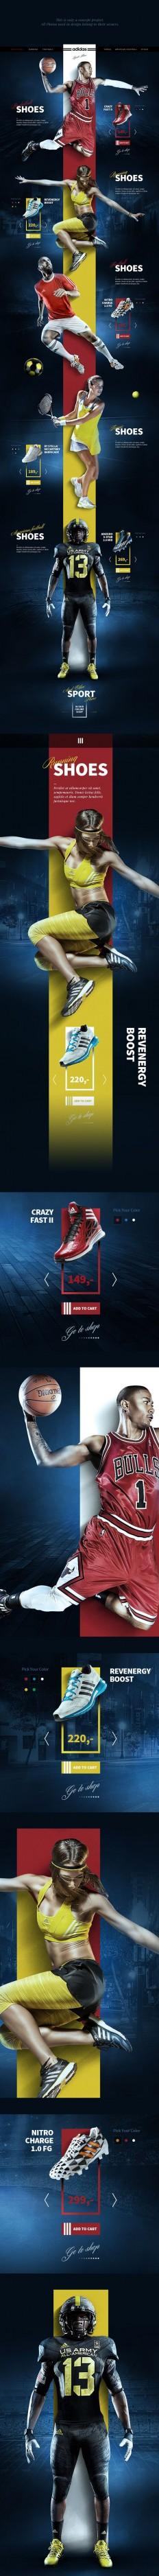 Sport Shoes Concept on Behance| SPORT • AD & DESING | Pinterest